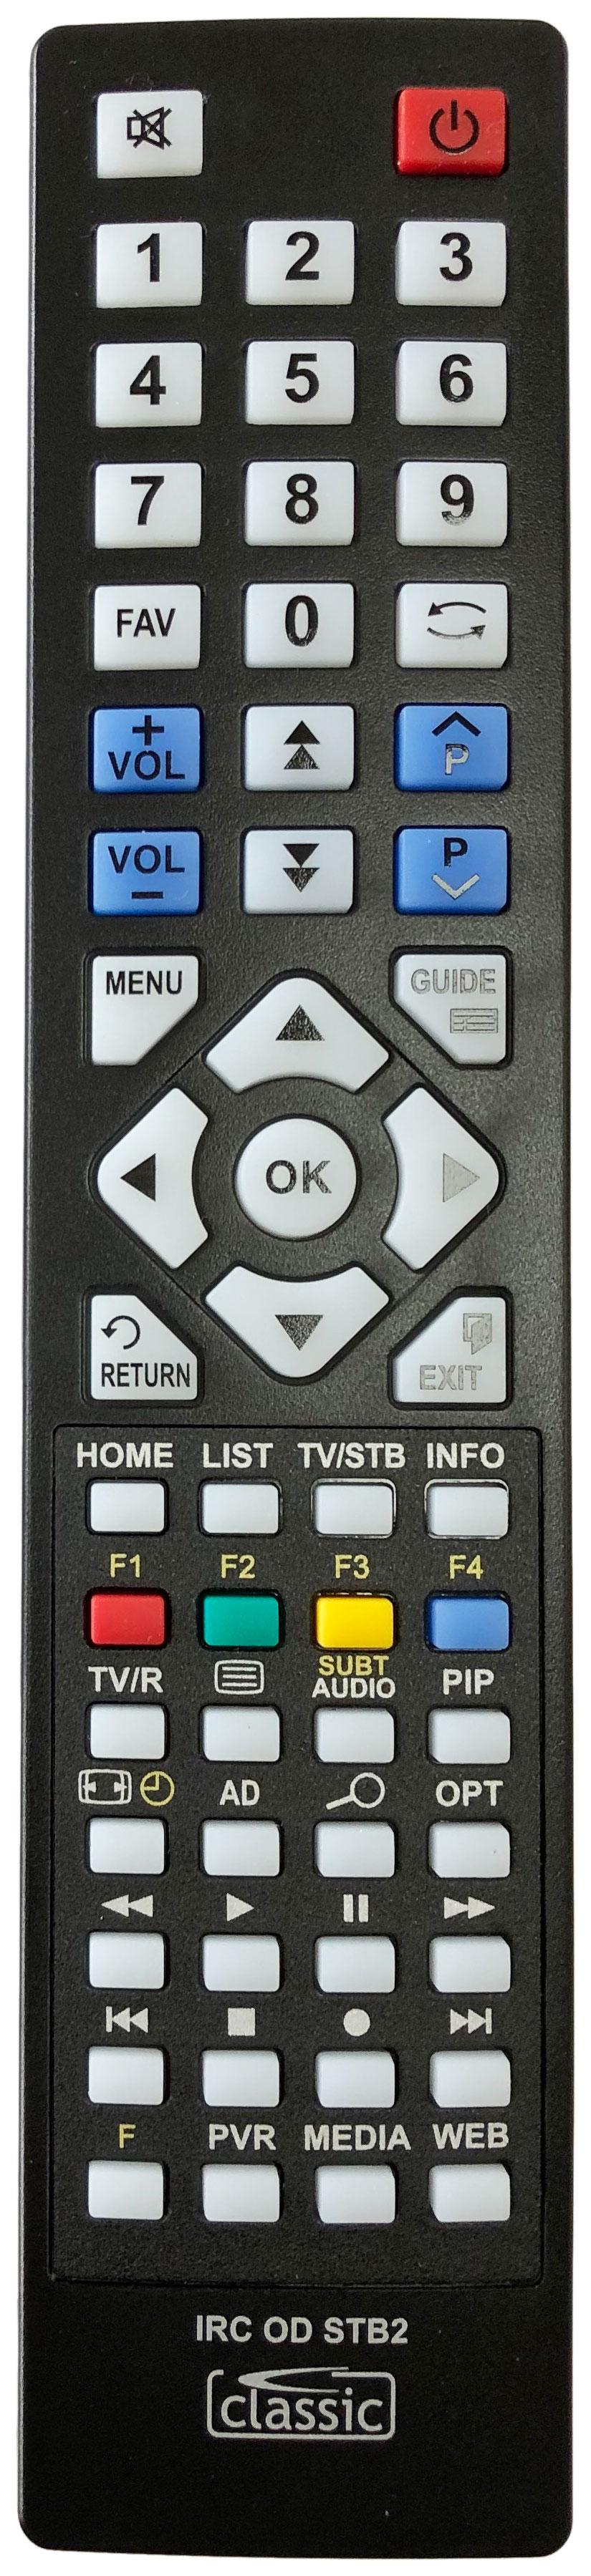 SAMSUNG GL59-00117A Remote Control Alternative